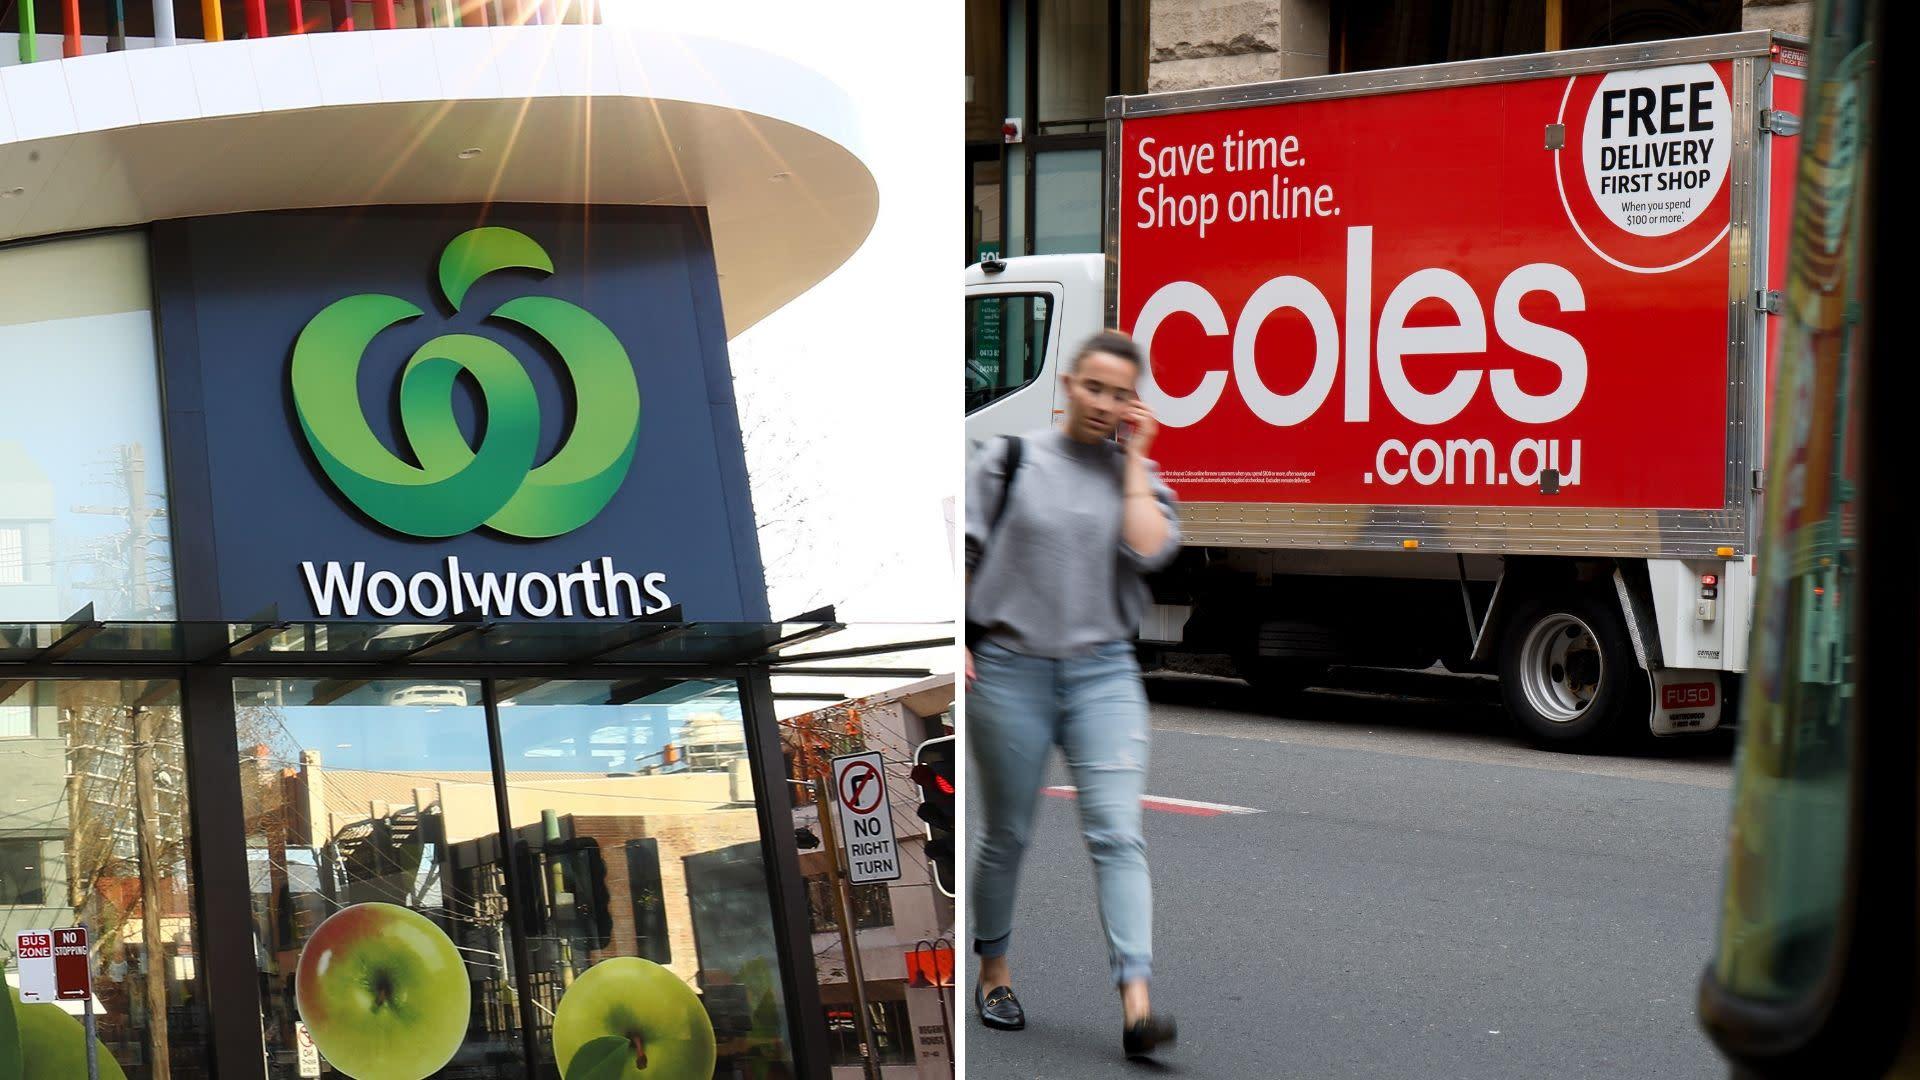 Half-price specials: Best Woolworths, Coles deals this week